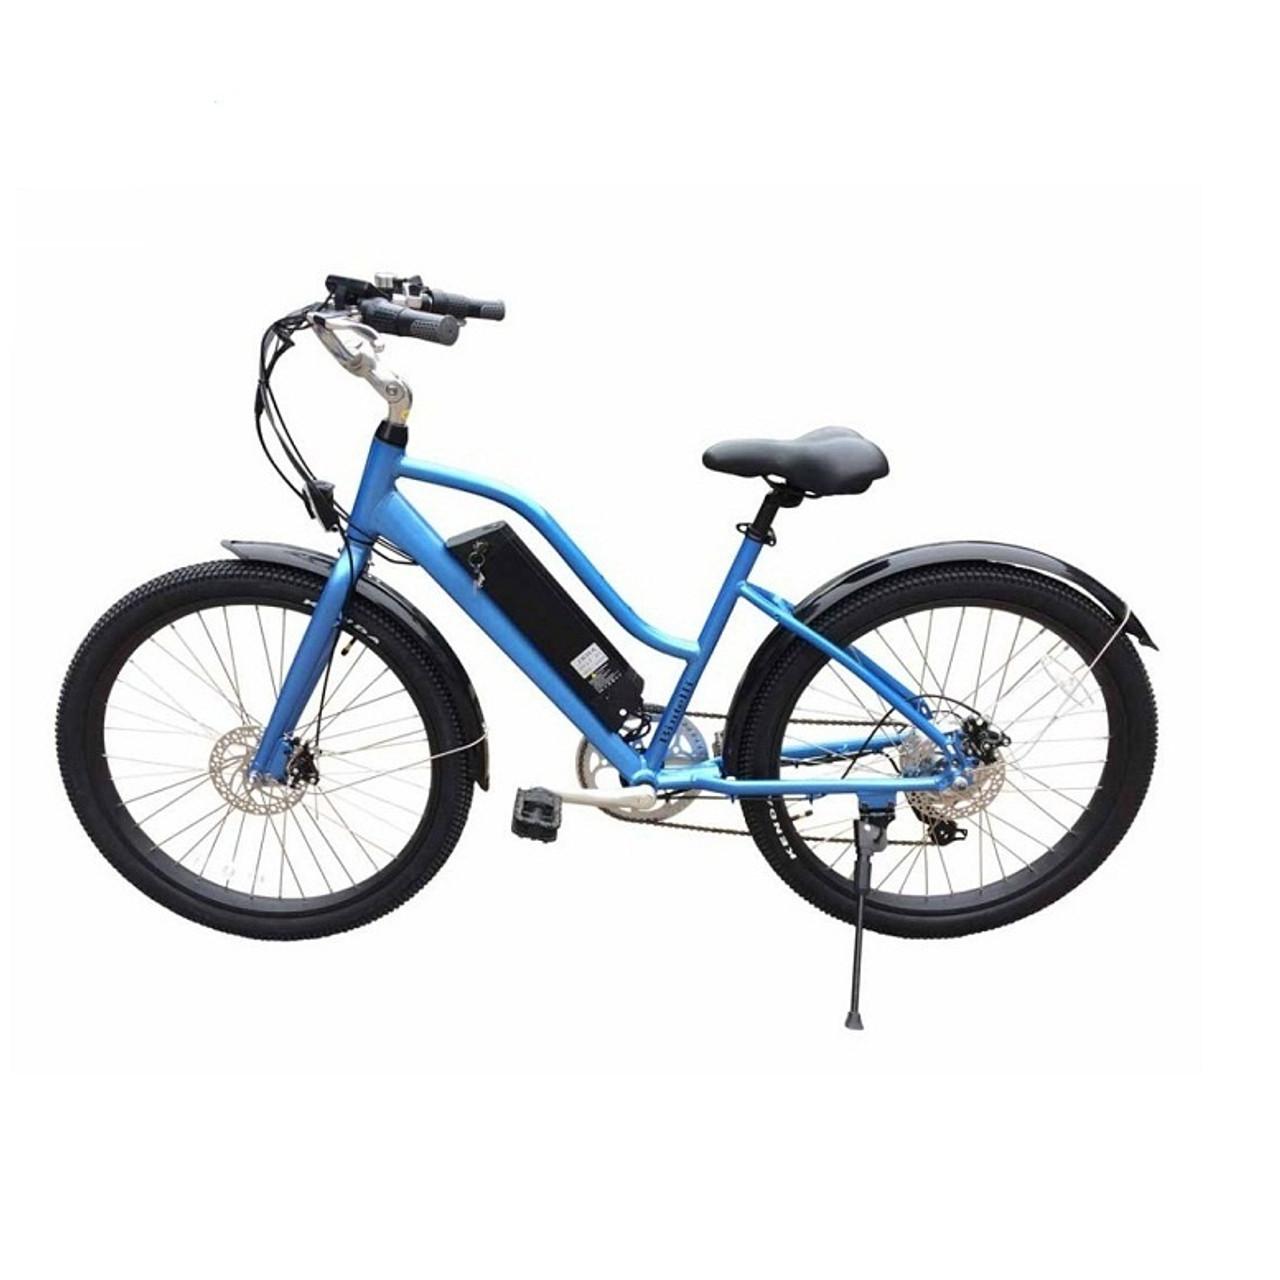 Bintelli B1 Electric Bicycle, Stylish Beach Cruiser